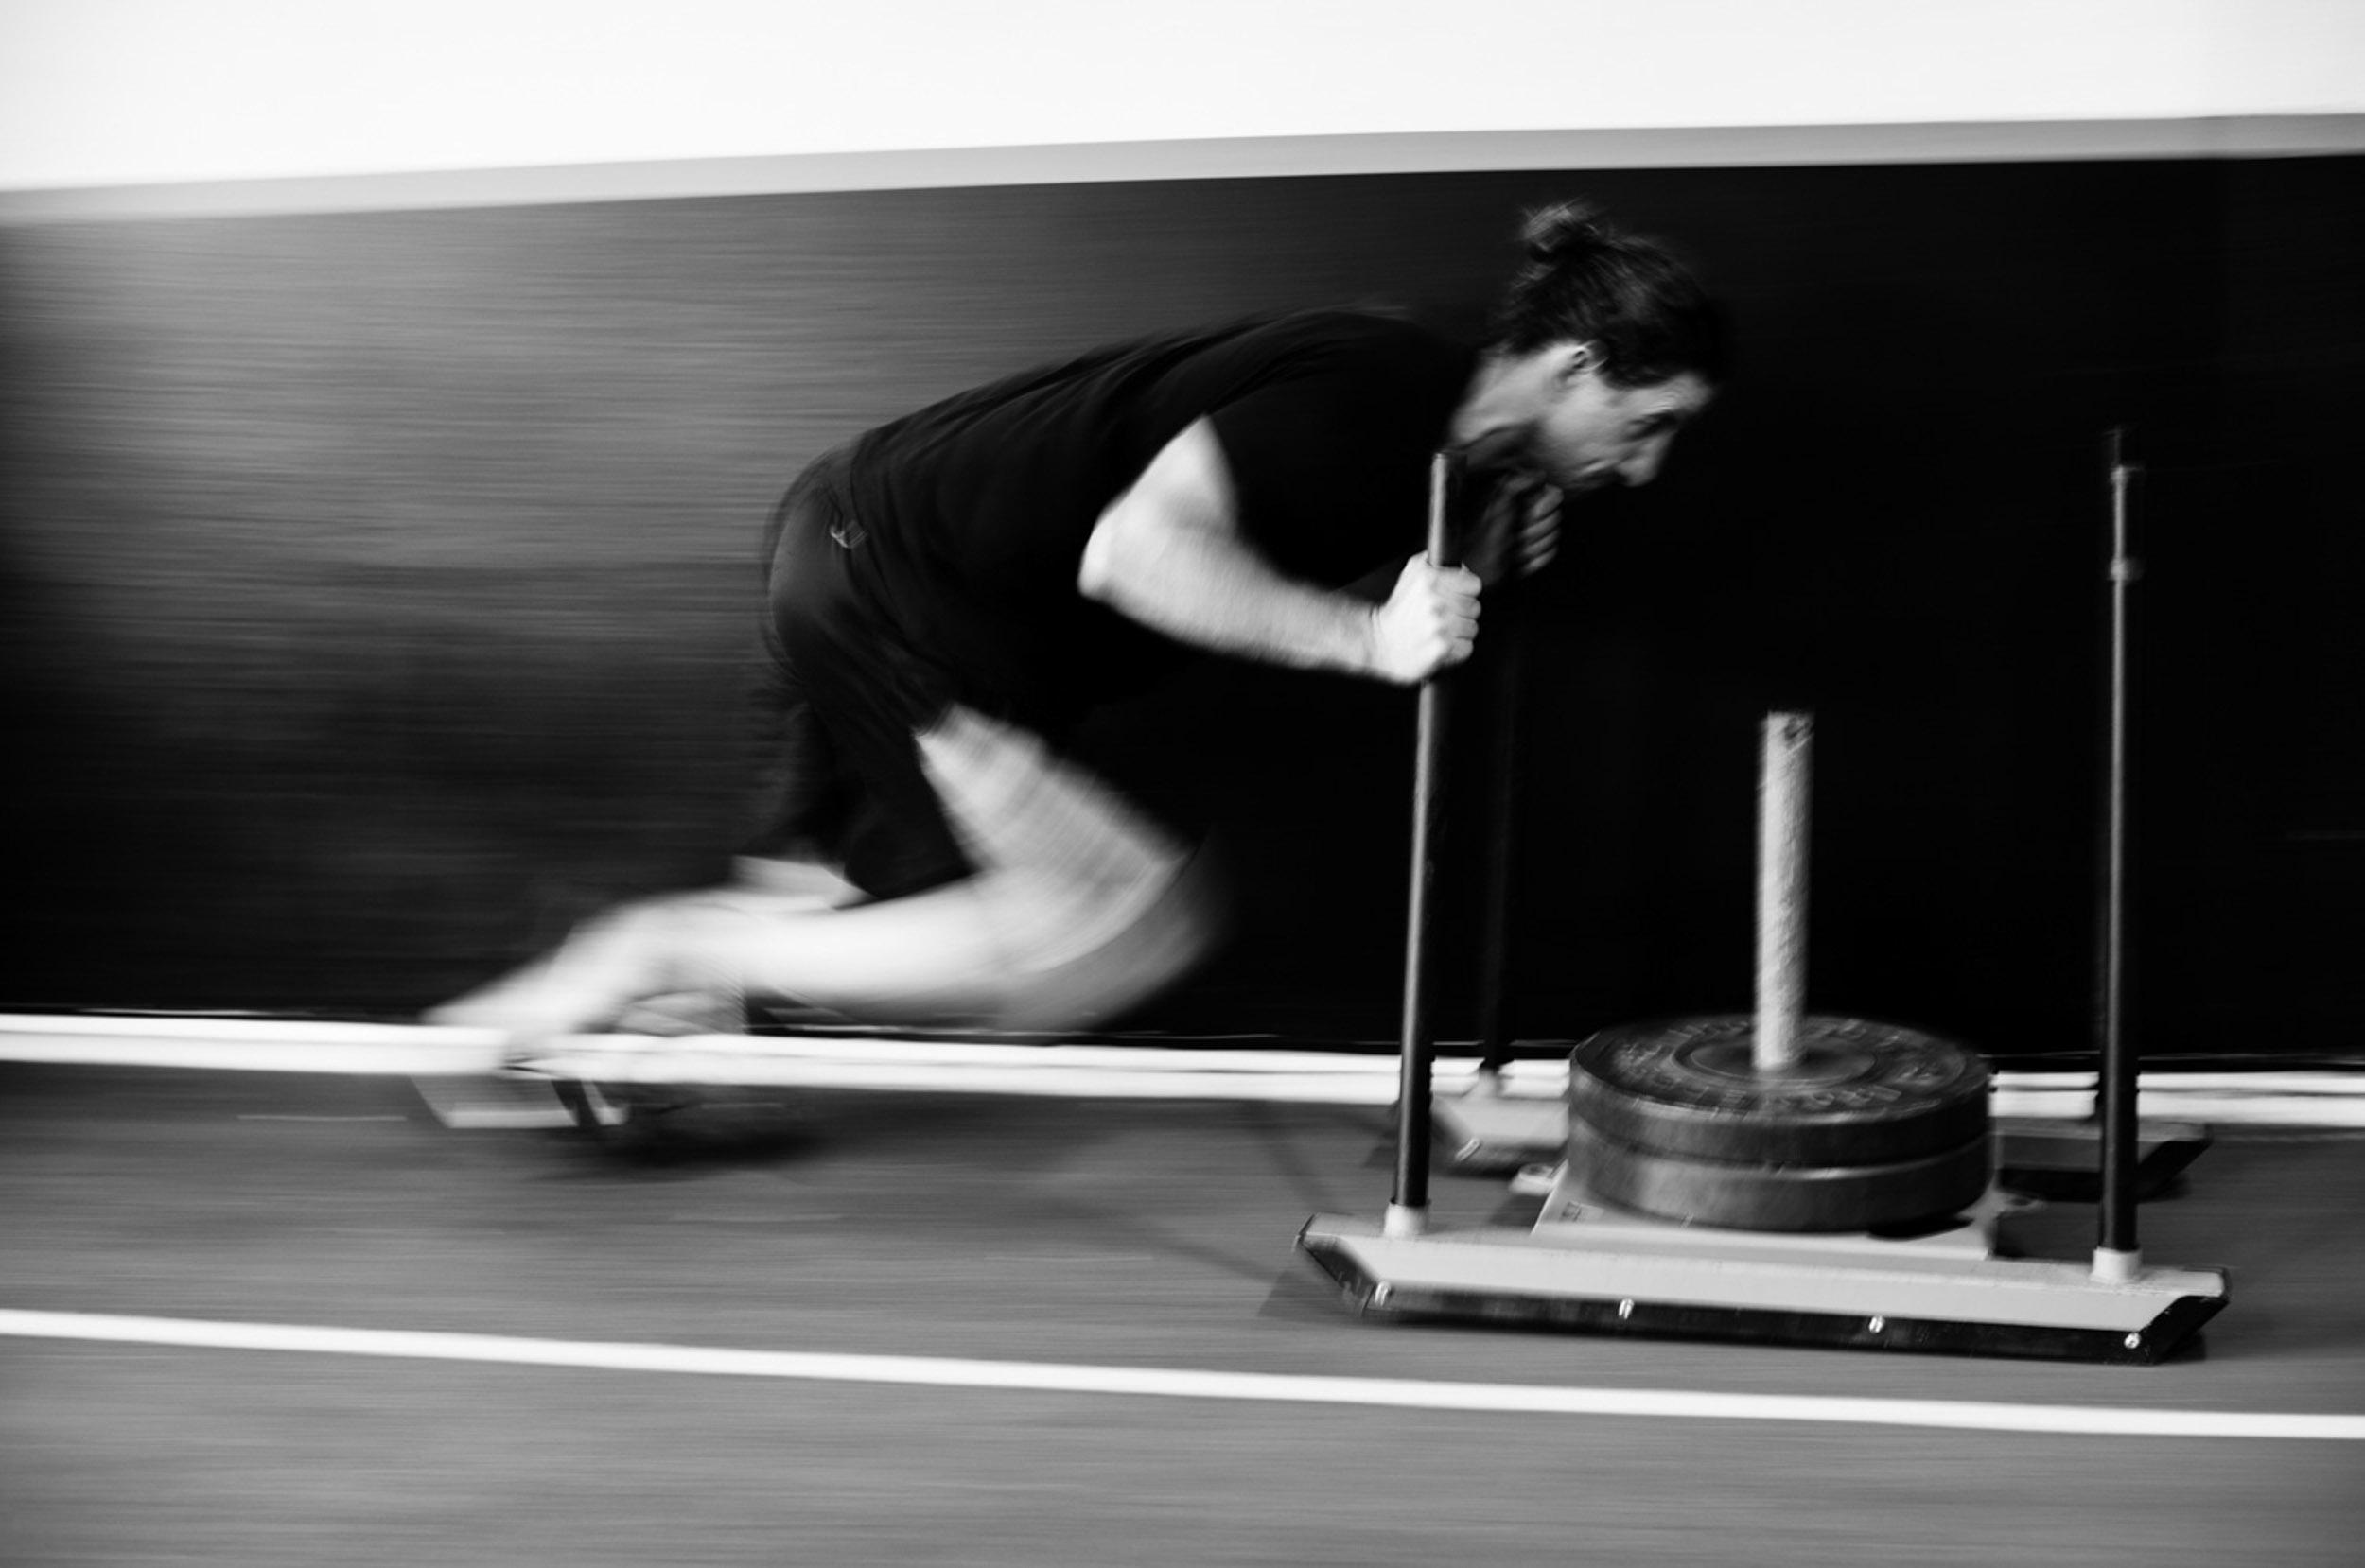 training_ops_sports_perfor_SP_DSC_7380.jpg